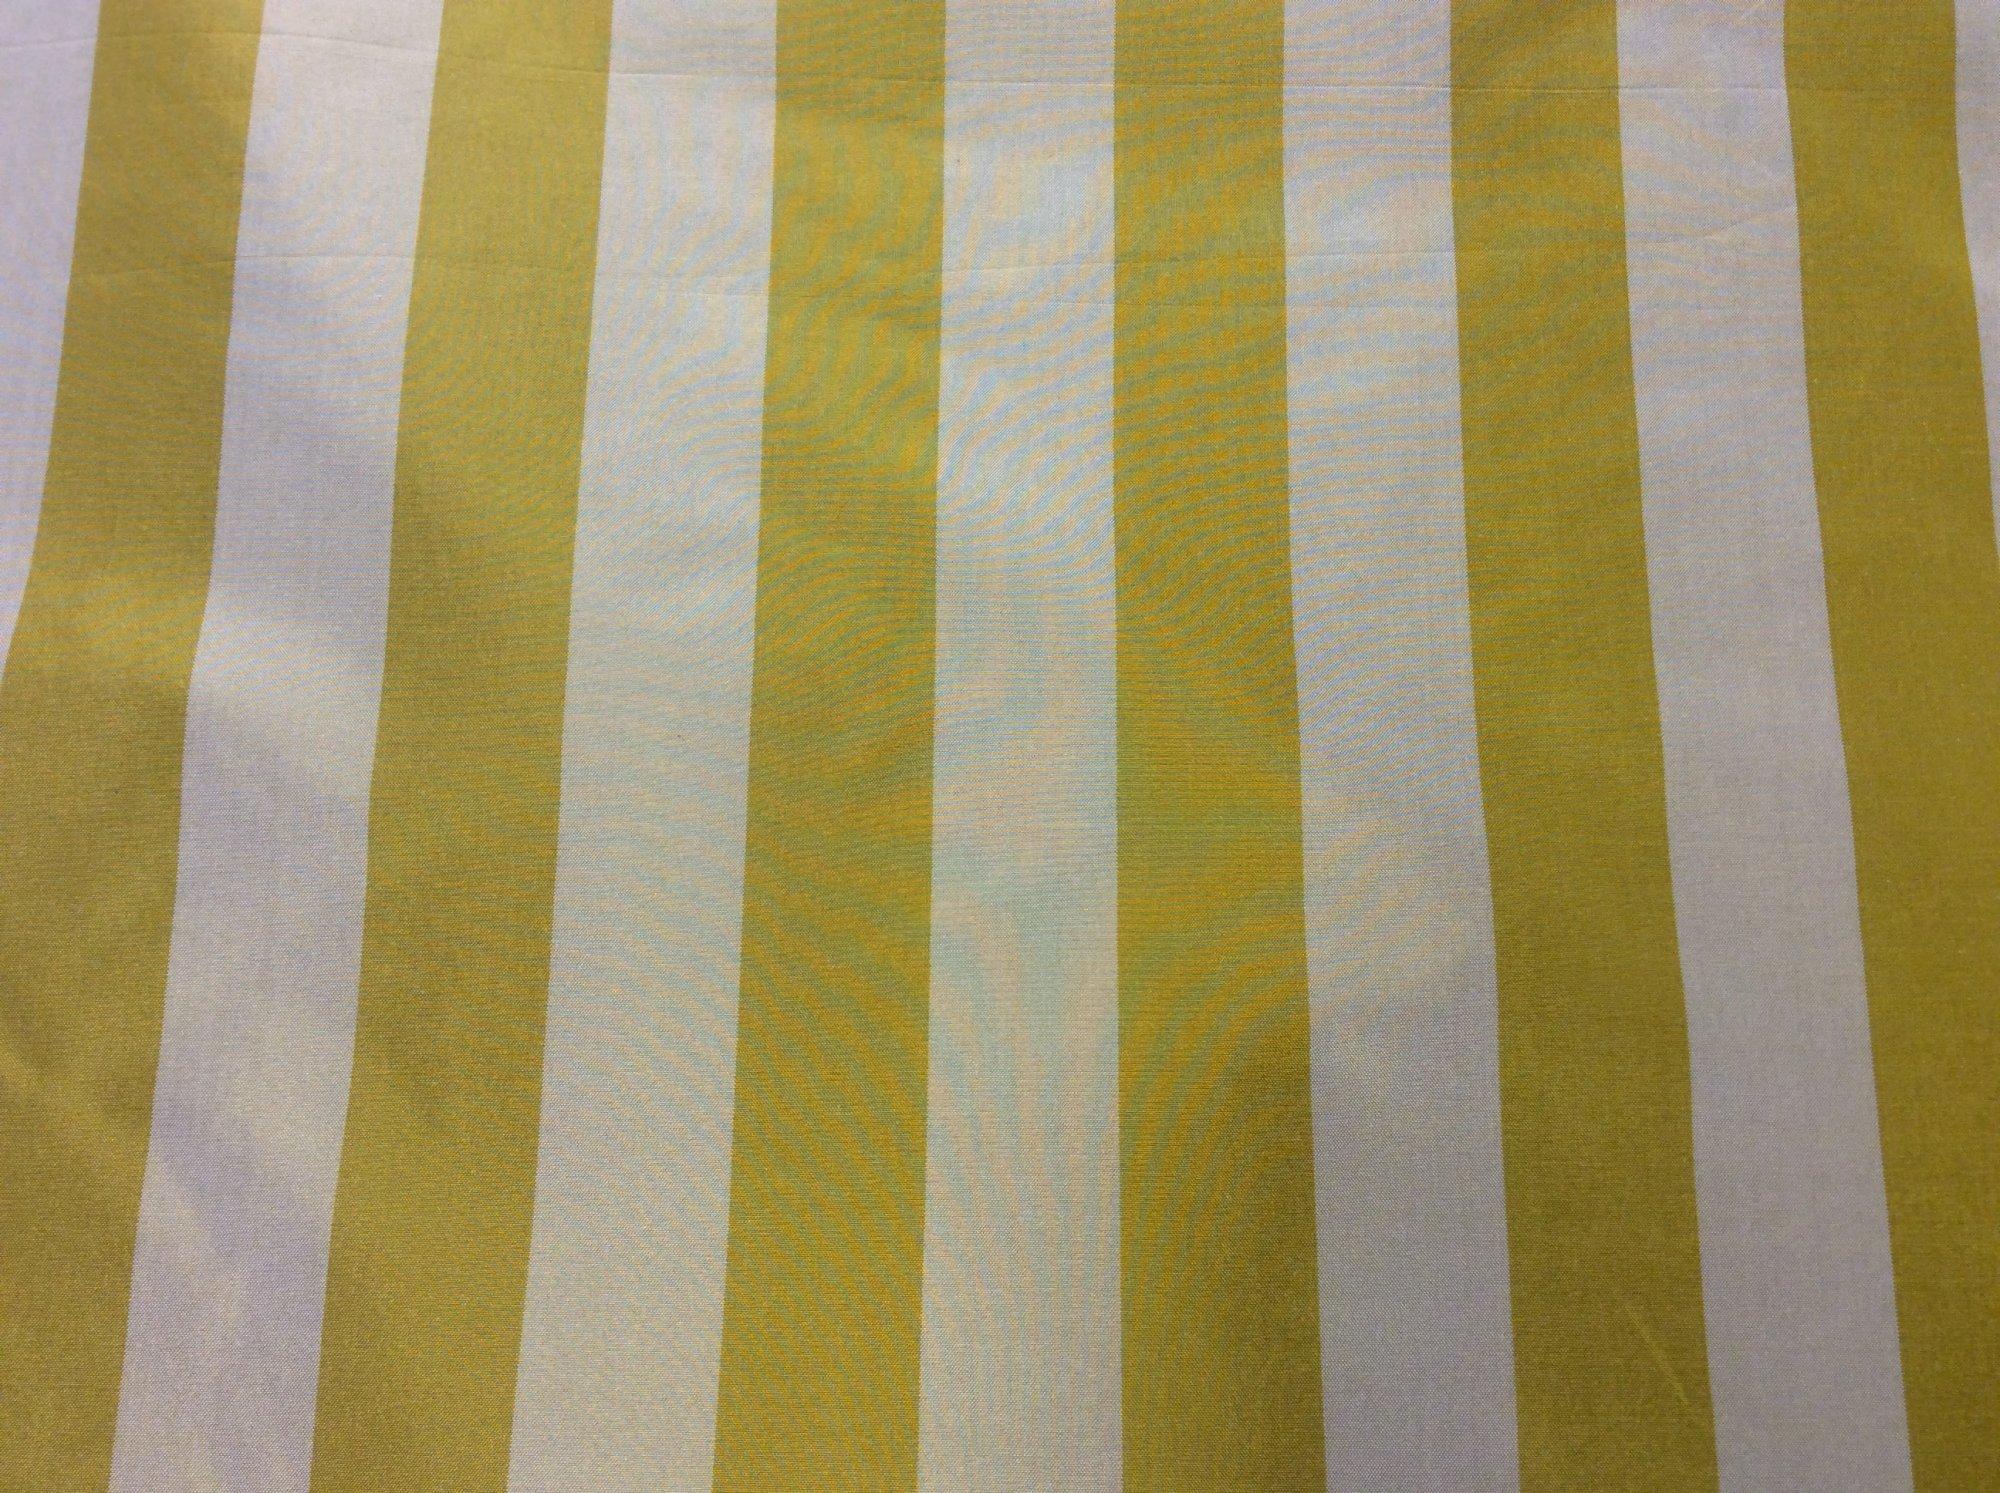 100% Silk Taffeta Yellow Gold Mustard Stripe. Drapery Apparel Fabric FM104